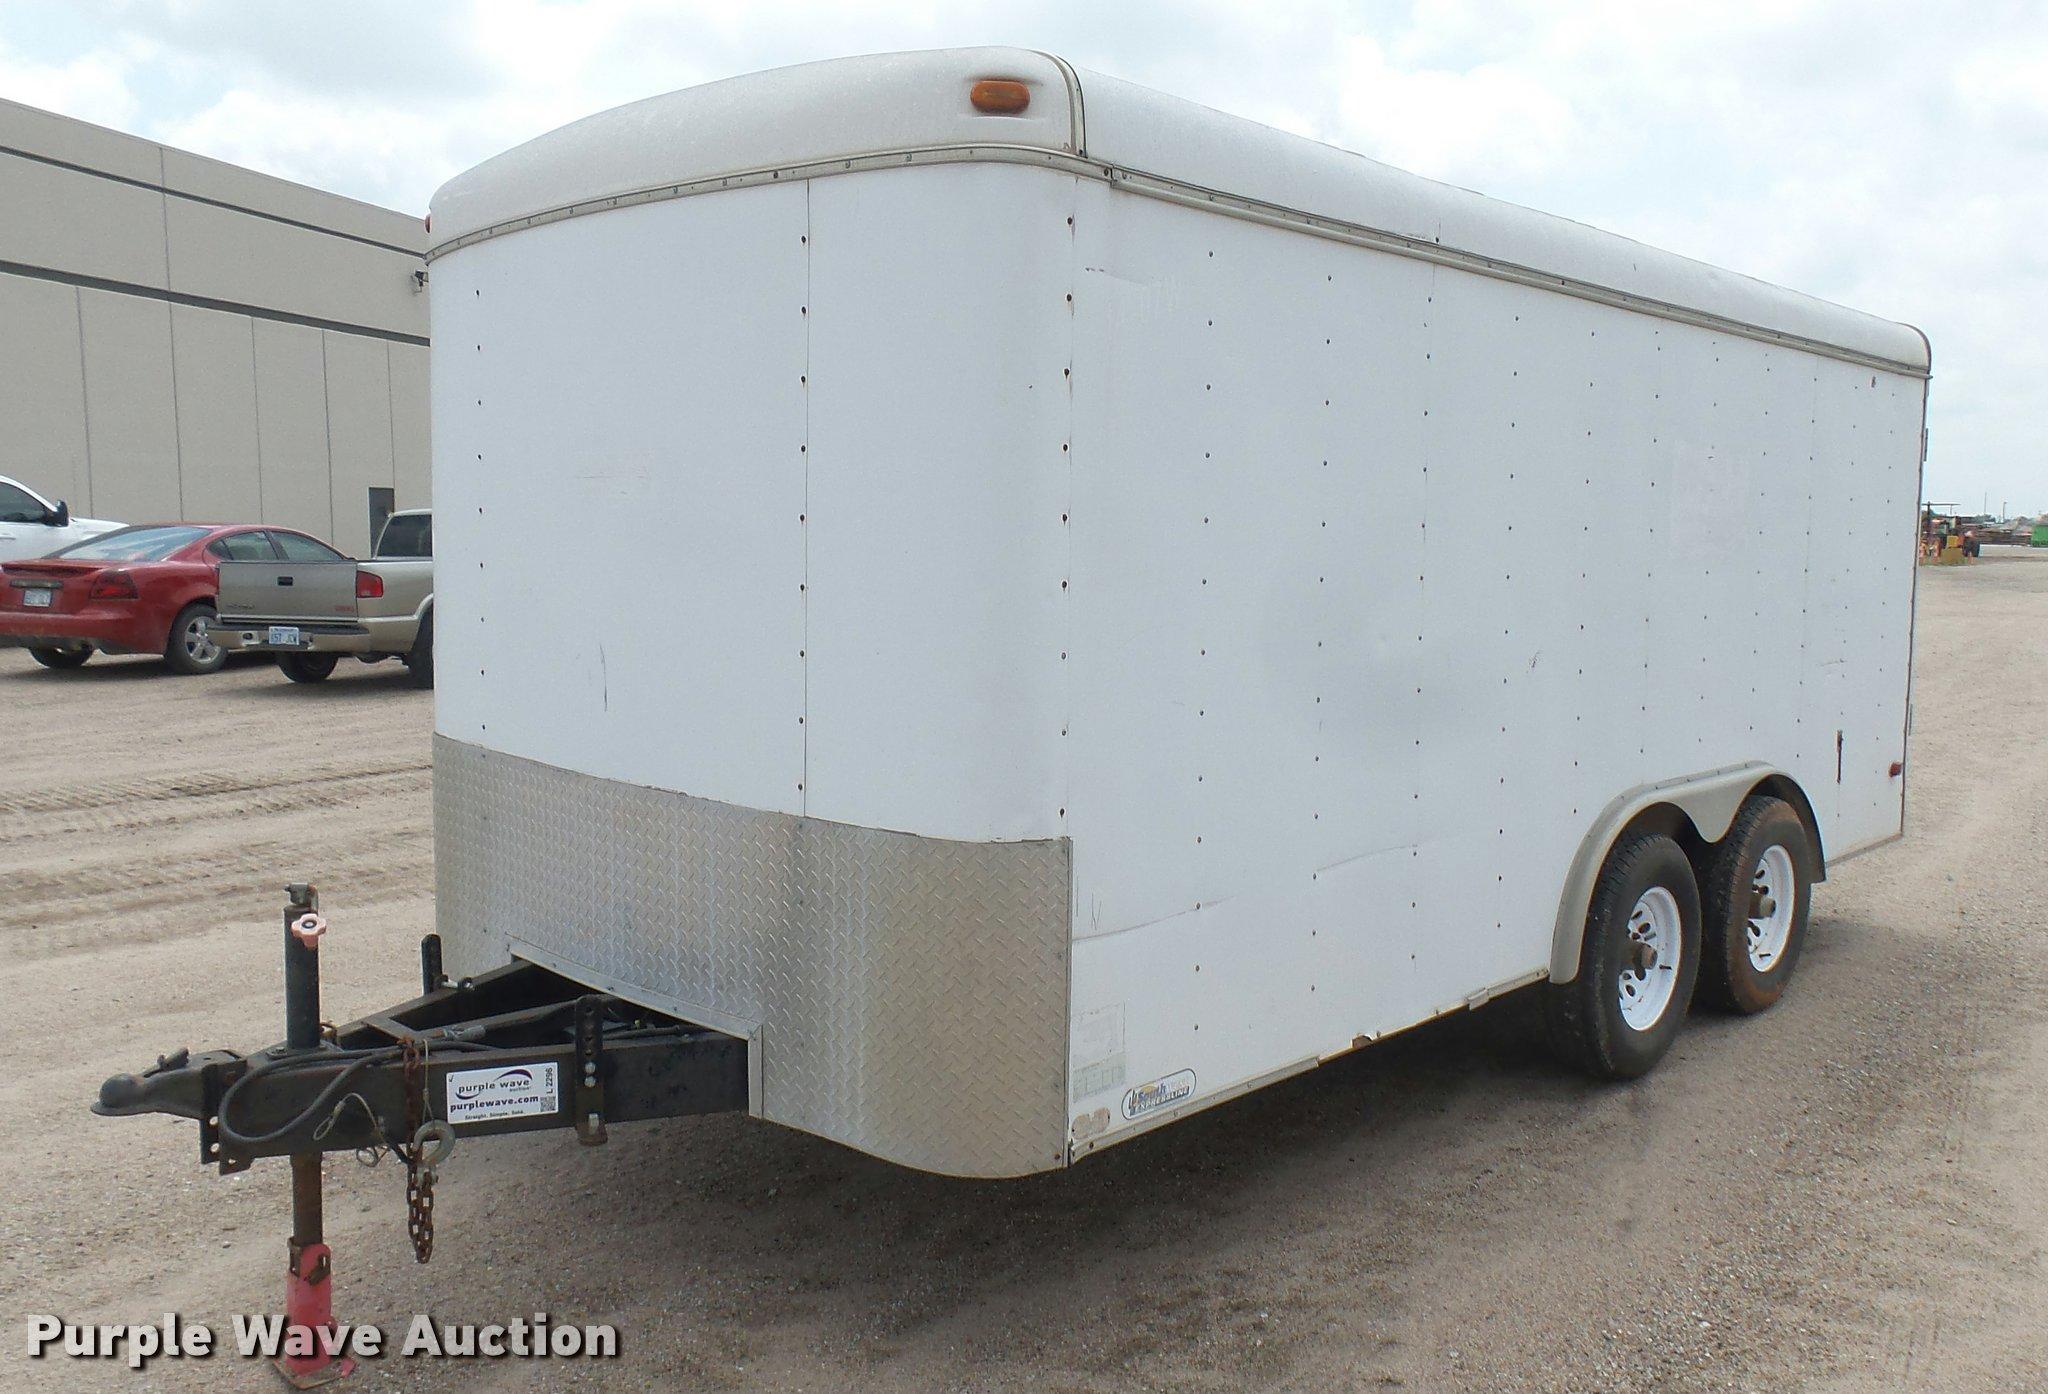 1999 Southwest Express Line enclosed cargo trailer